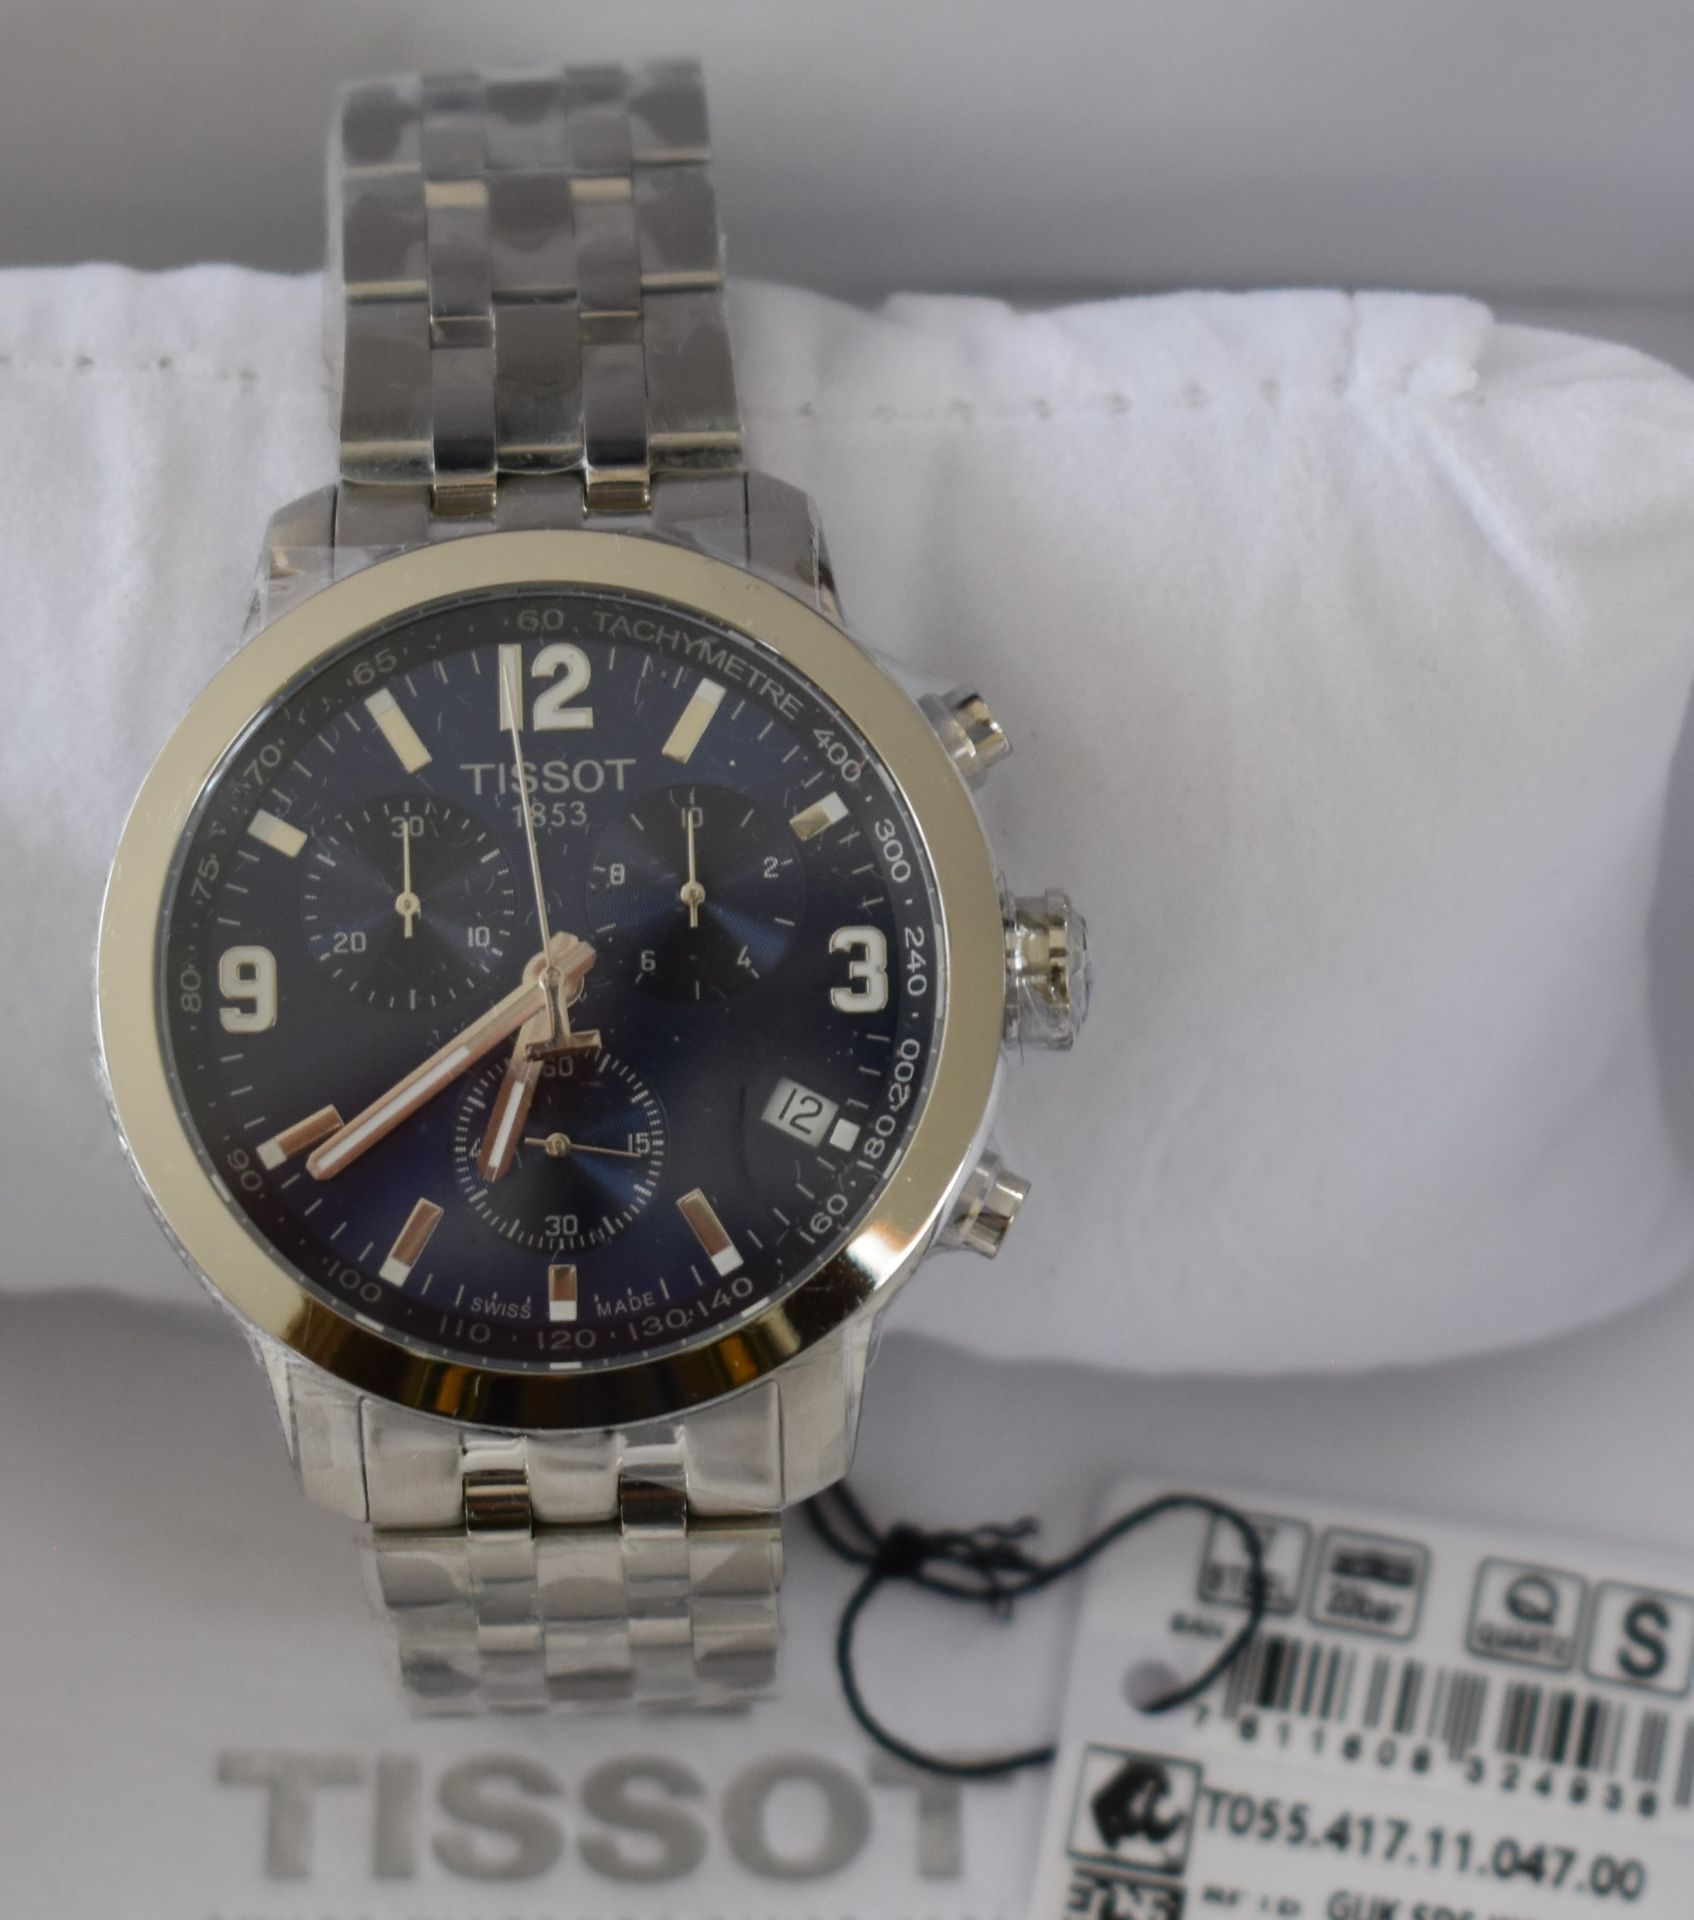 Tissot Men's Watch TO55.417.11.047.00 - Image 2 of 3